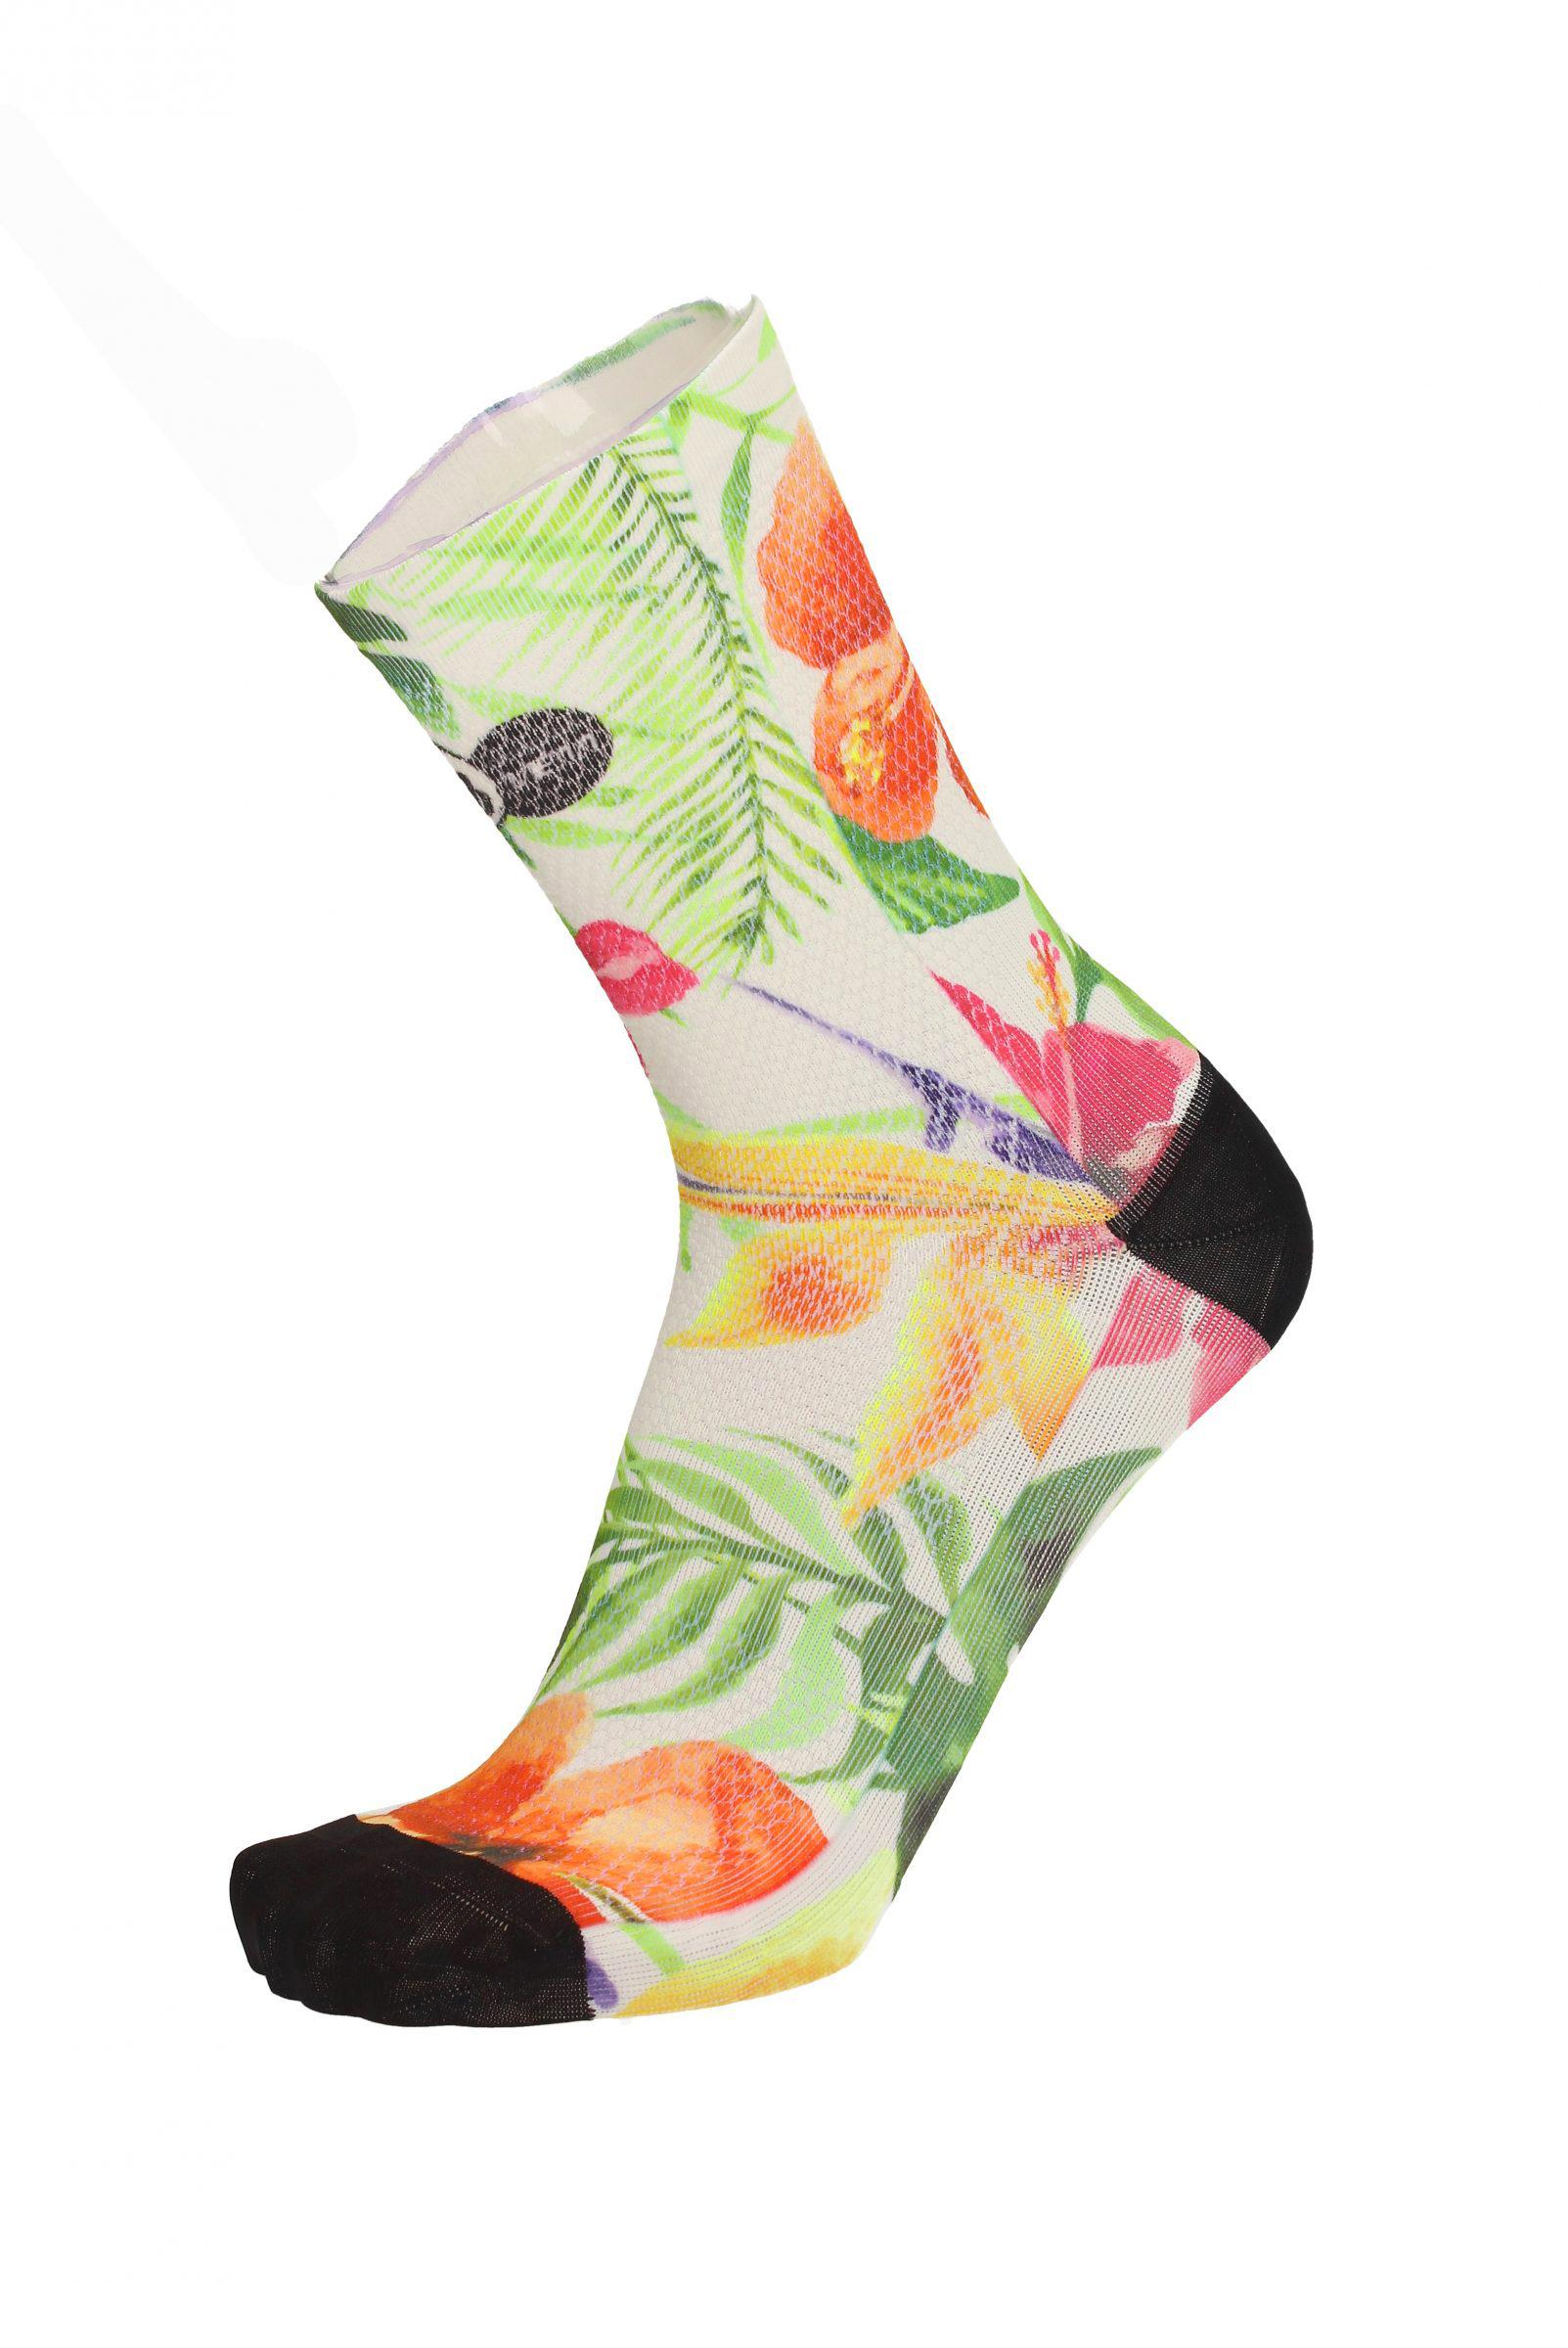 Čarape MBWear FUN 15 Flowers